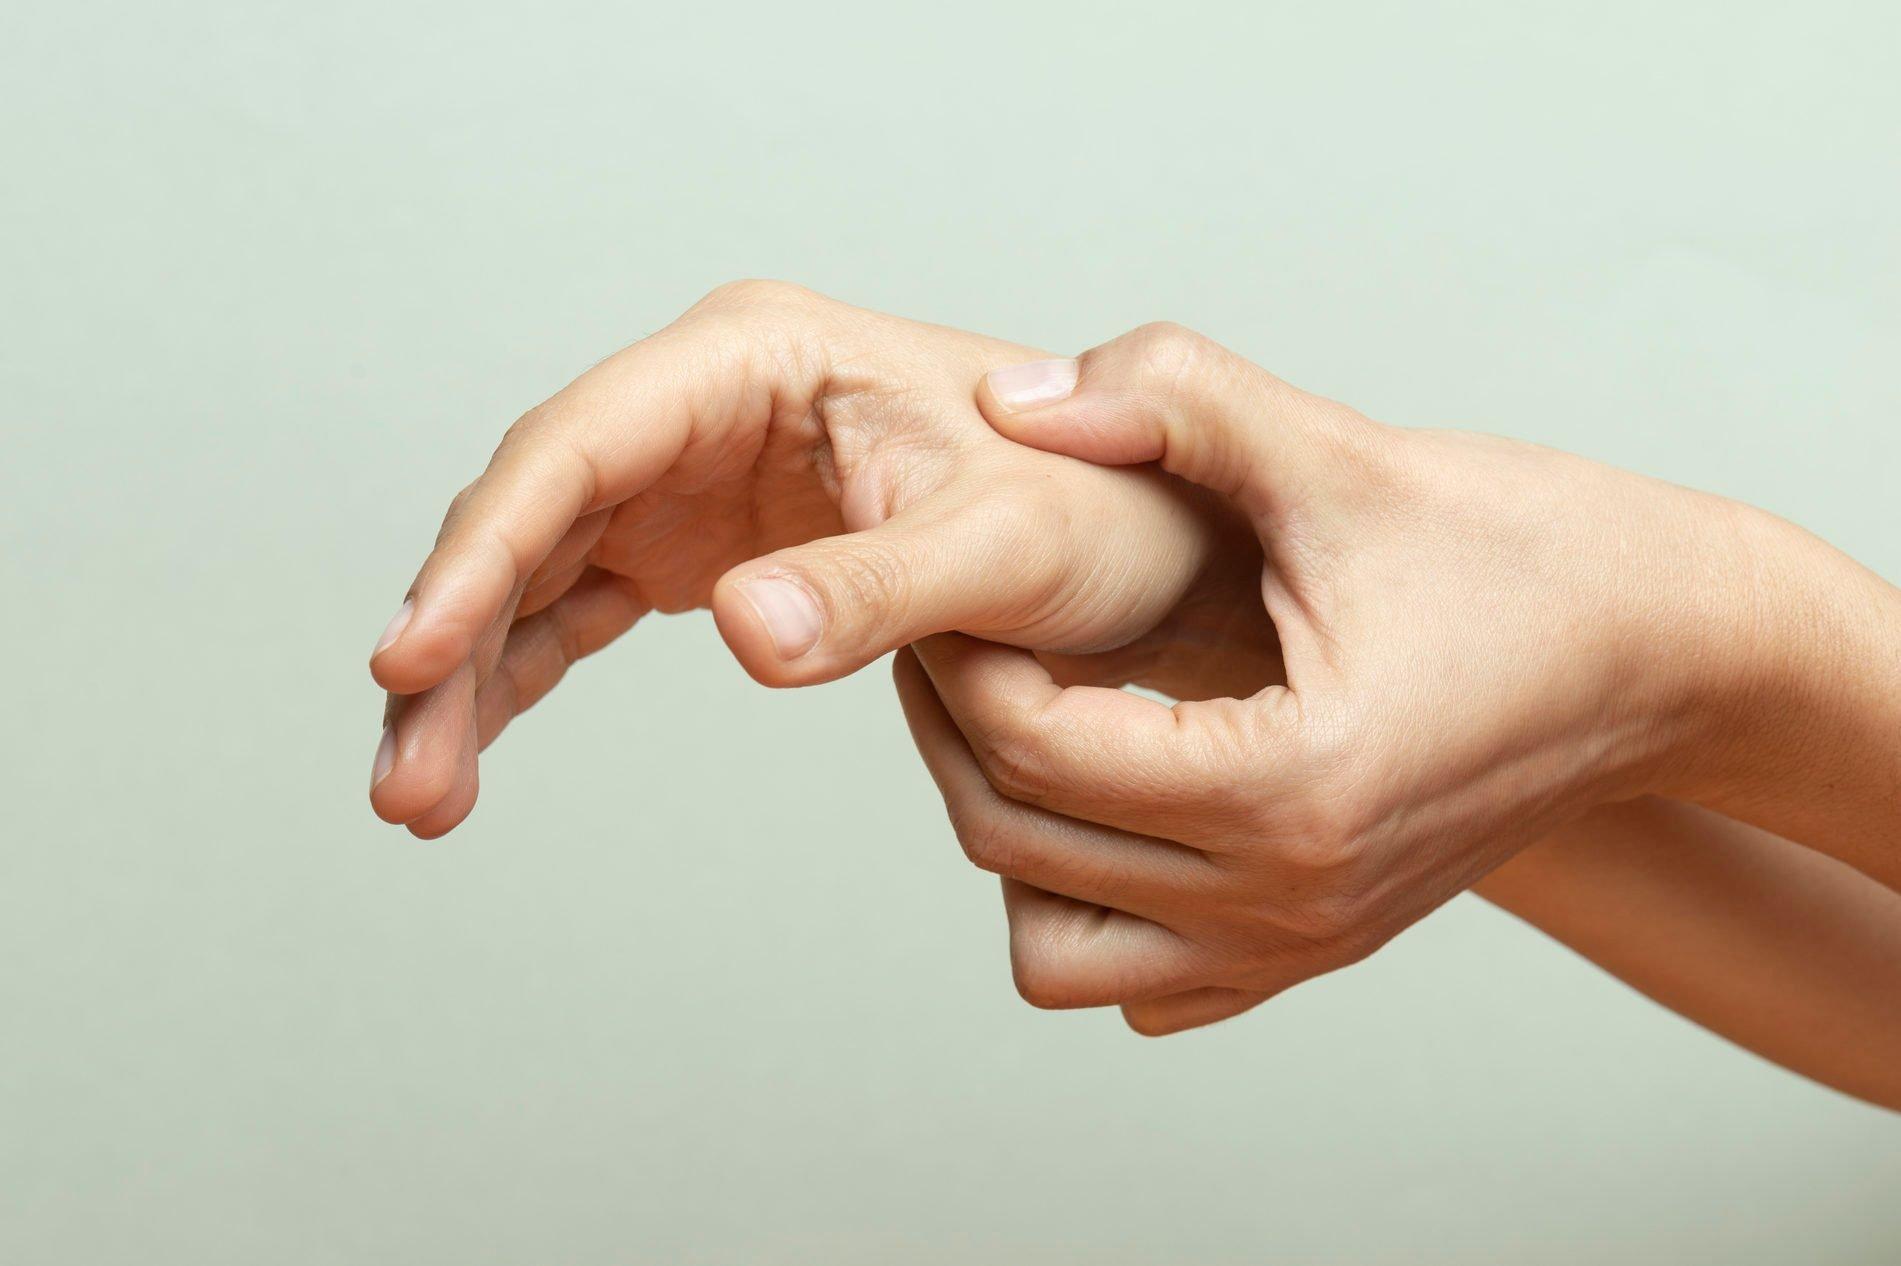 What Causes Thumb Pain? 7 Reasons Your Thumb May Hurt